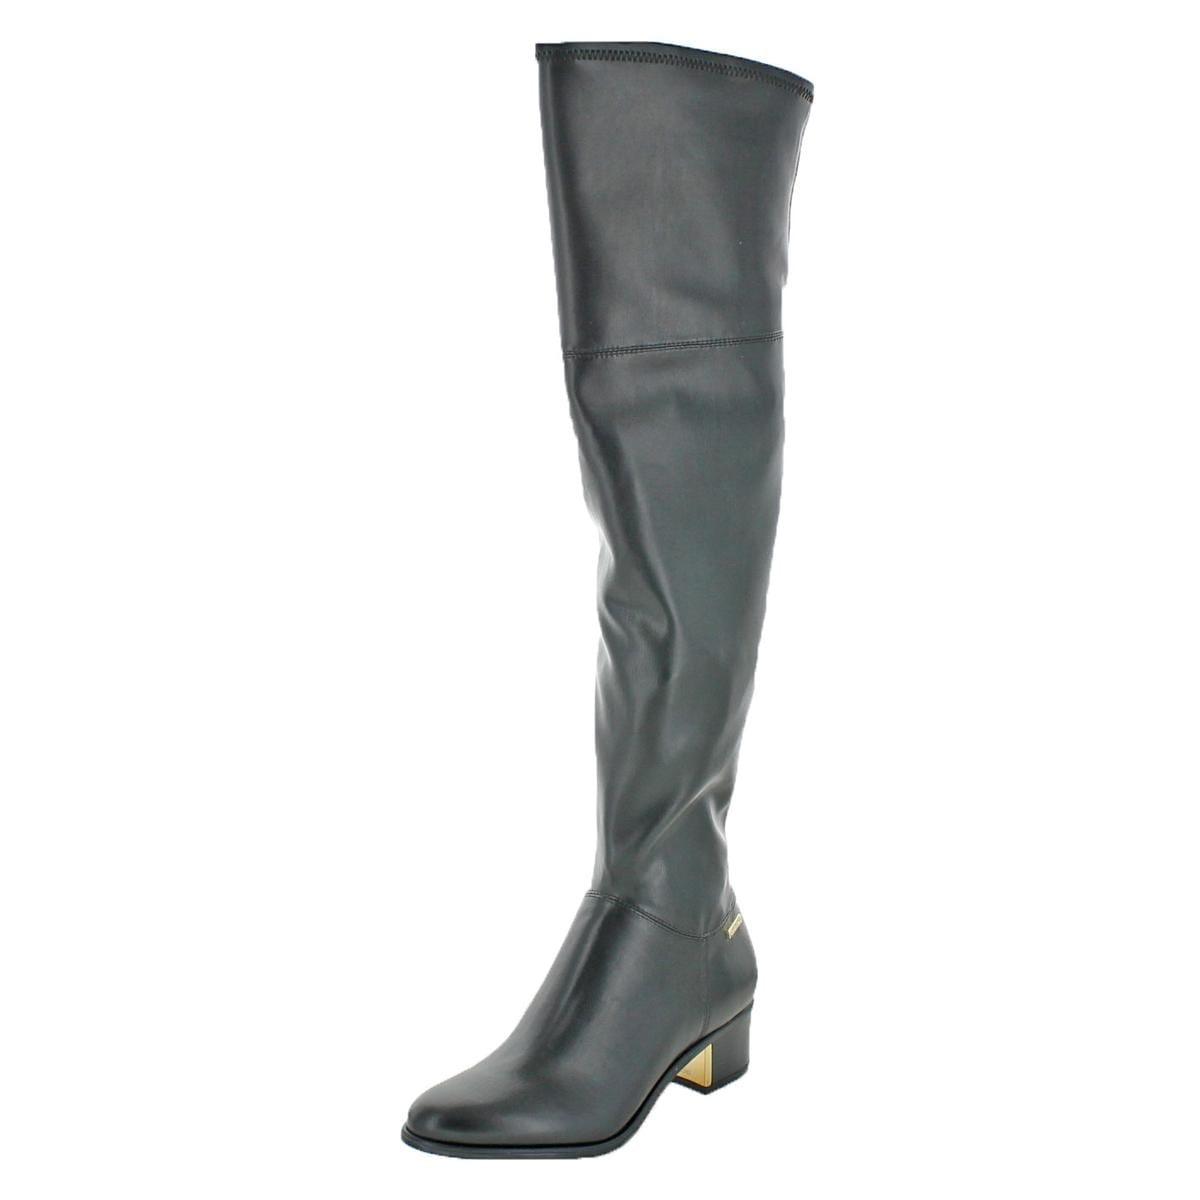 24dba5fa21a Calvin Klein Womens Carli Over-The-Knee Boots Leather Neoprene